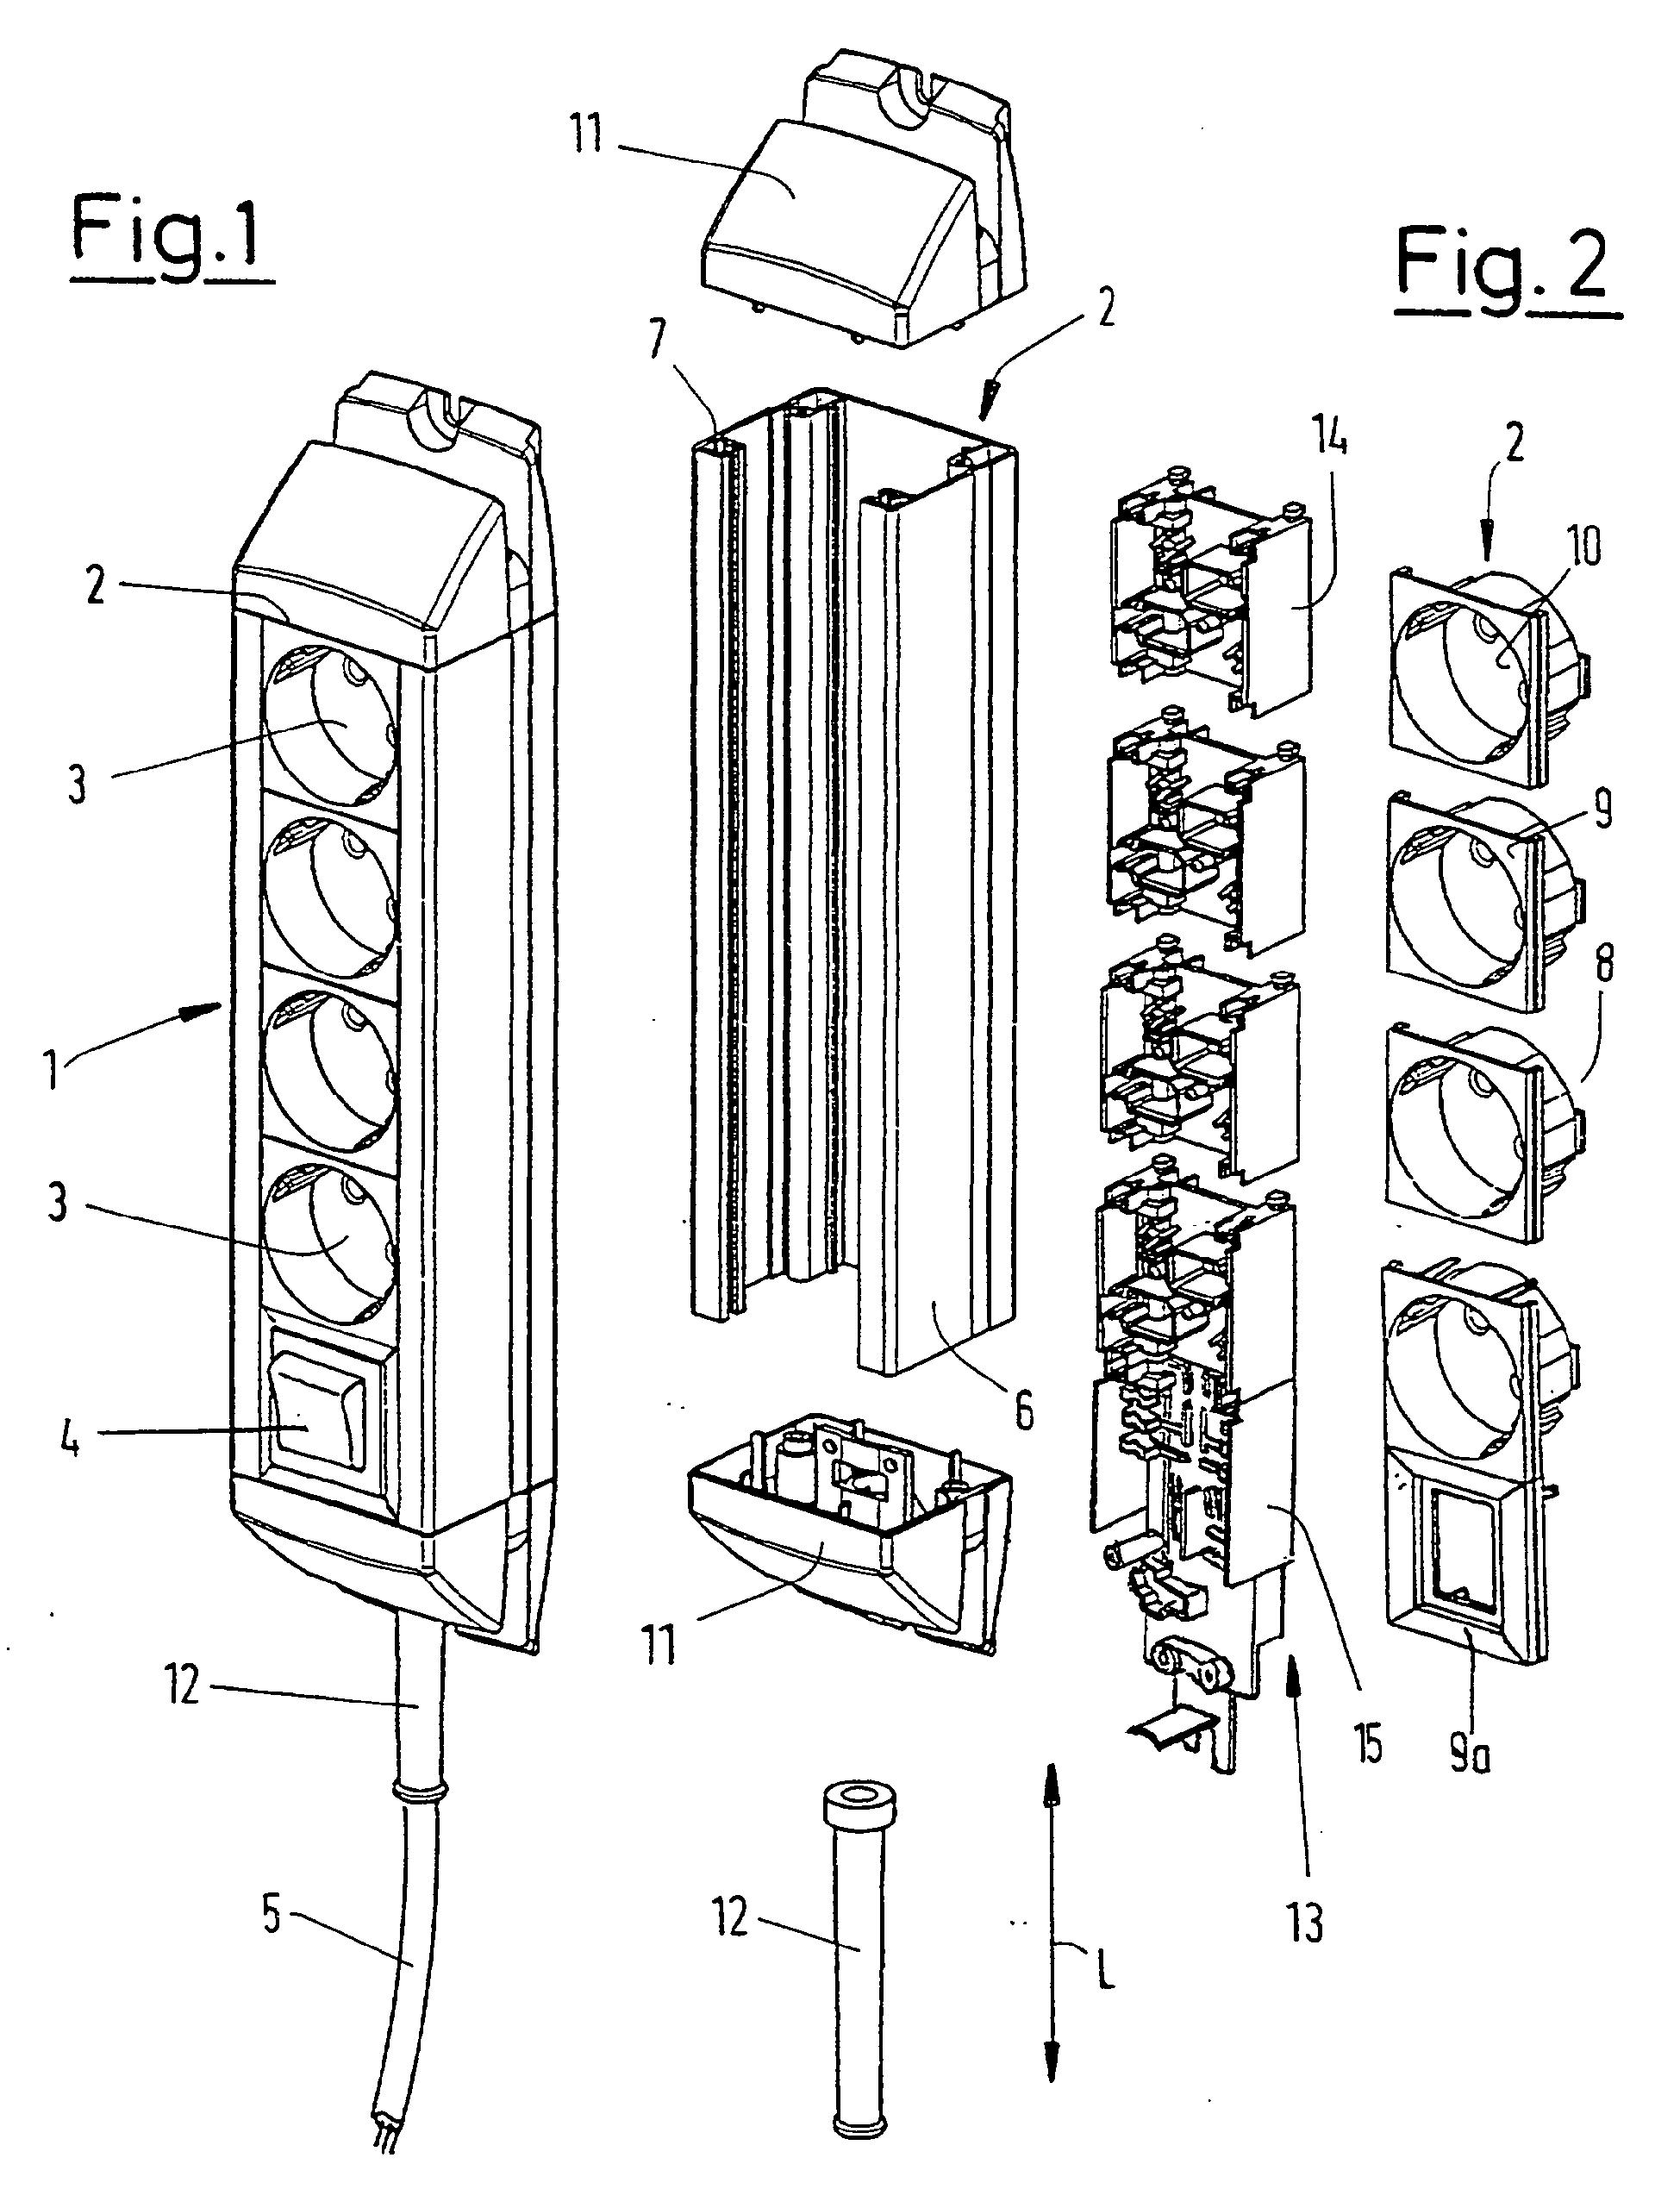 patent ep0951105b1 mehrfachsteckdose google patents. Black Bedroom Furniture Sets. Home Design Ideas